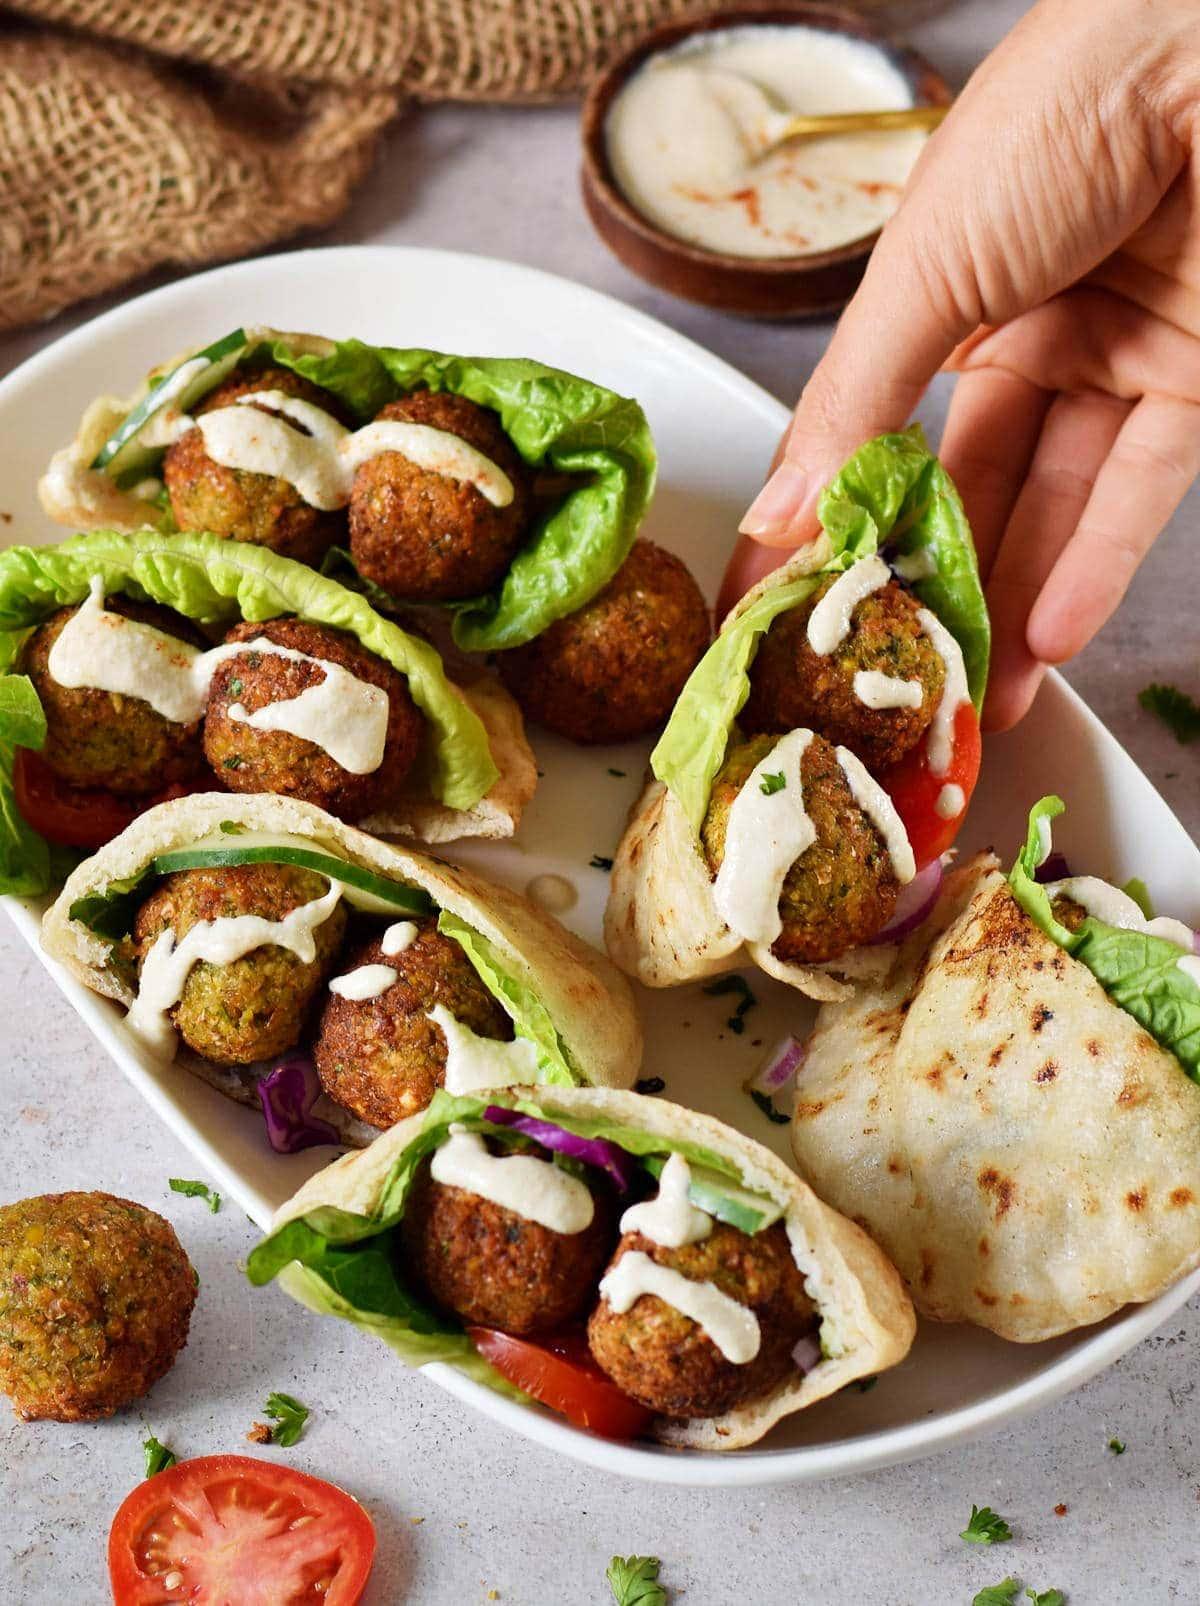 hand grabbing gluten-free pita stuffed with falafel